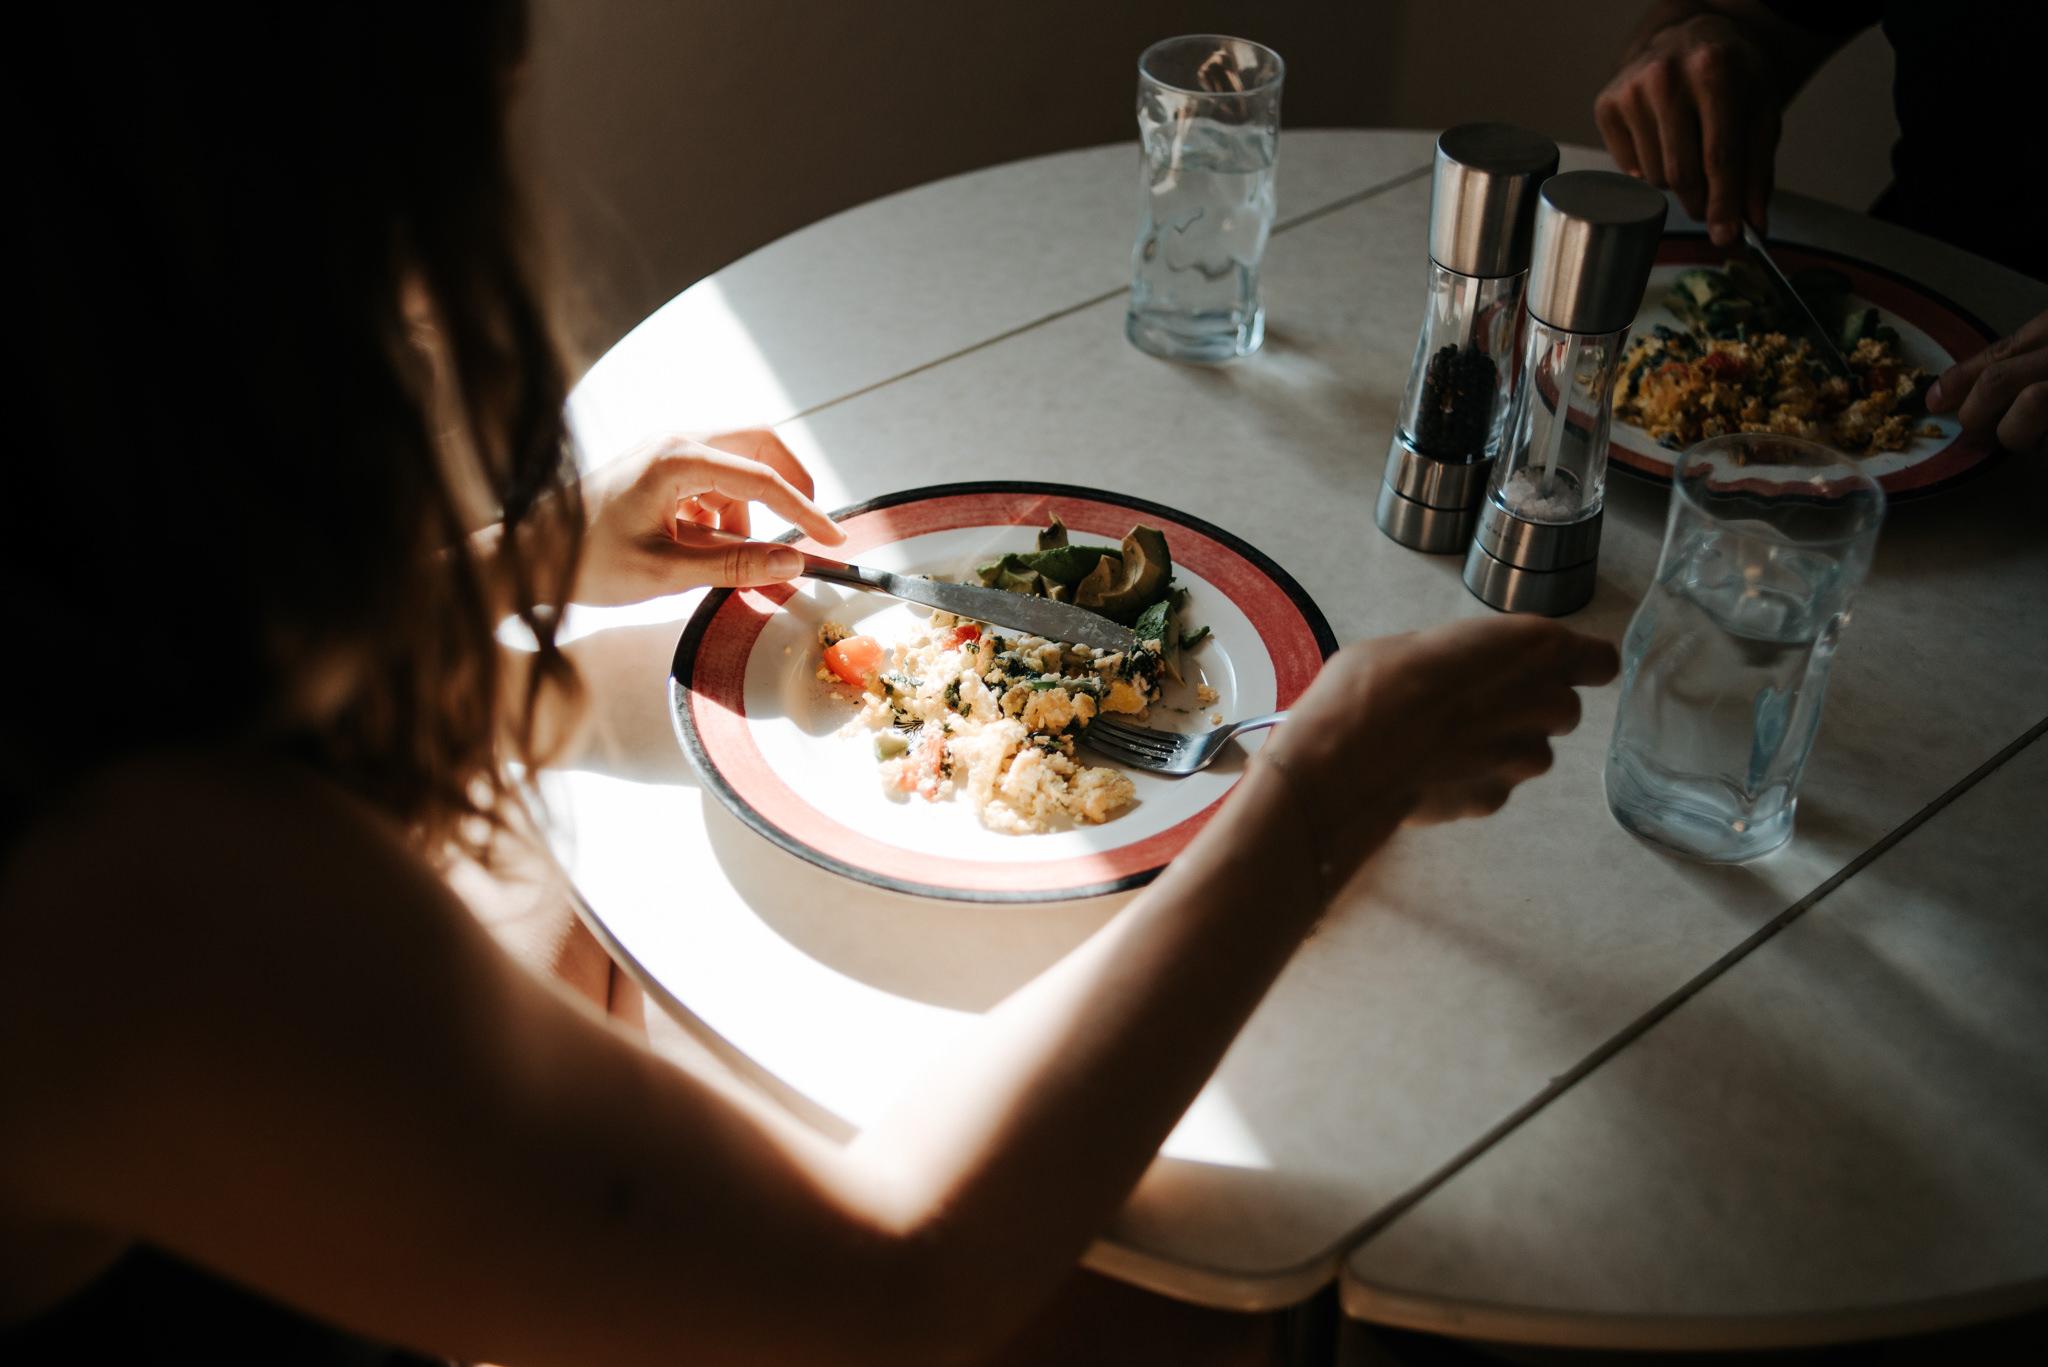 Omelet breakfast on plate in sunlight